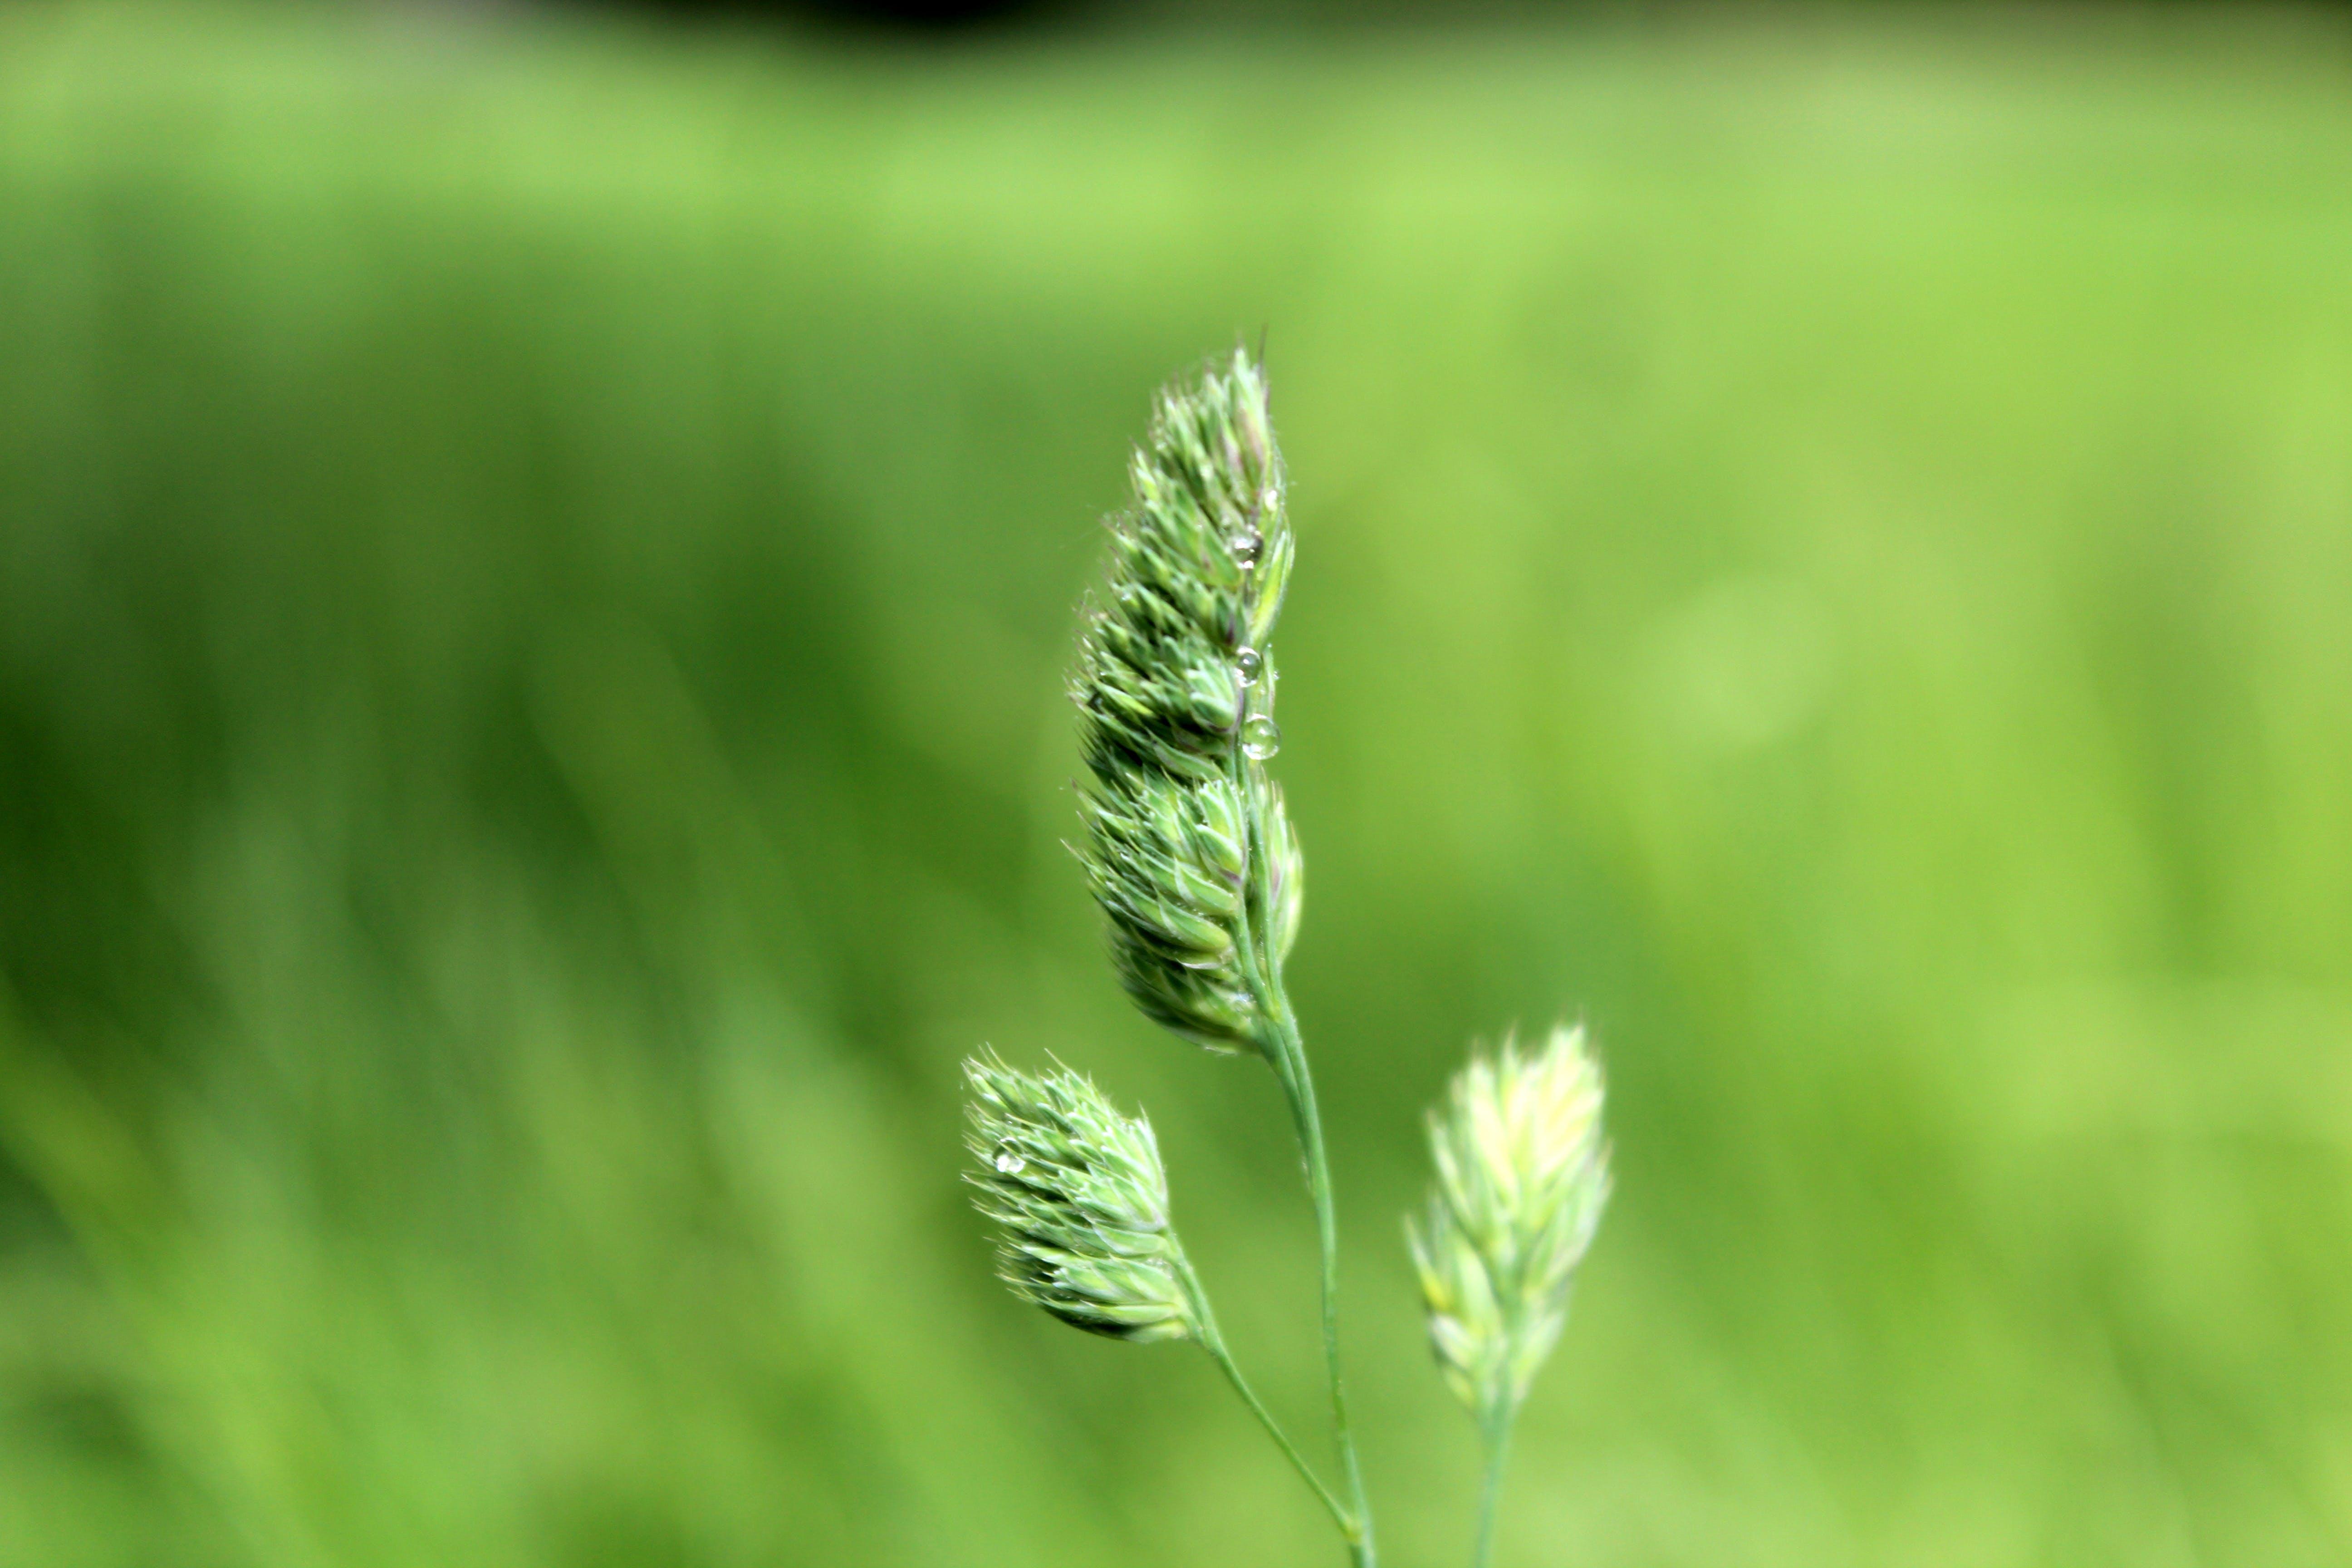 Macro Photography of Green Crowfoot Grass Flower